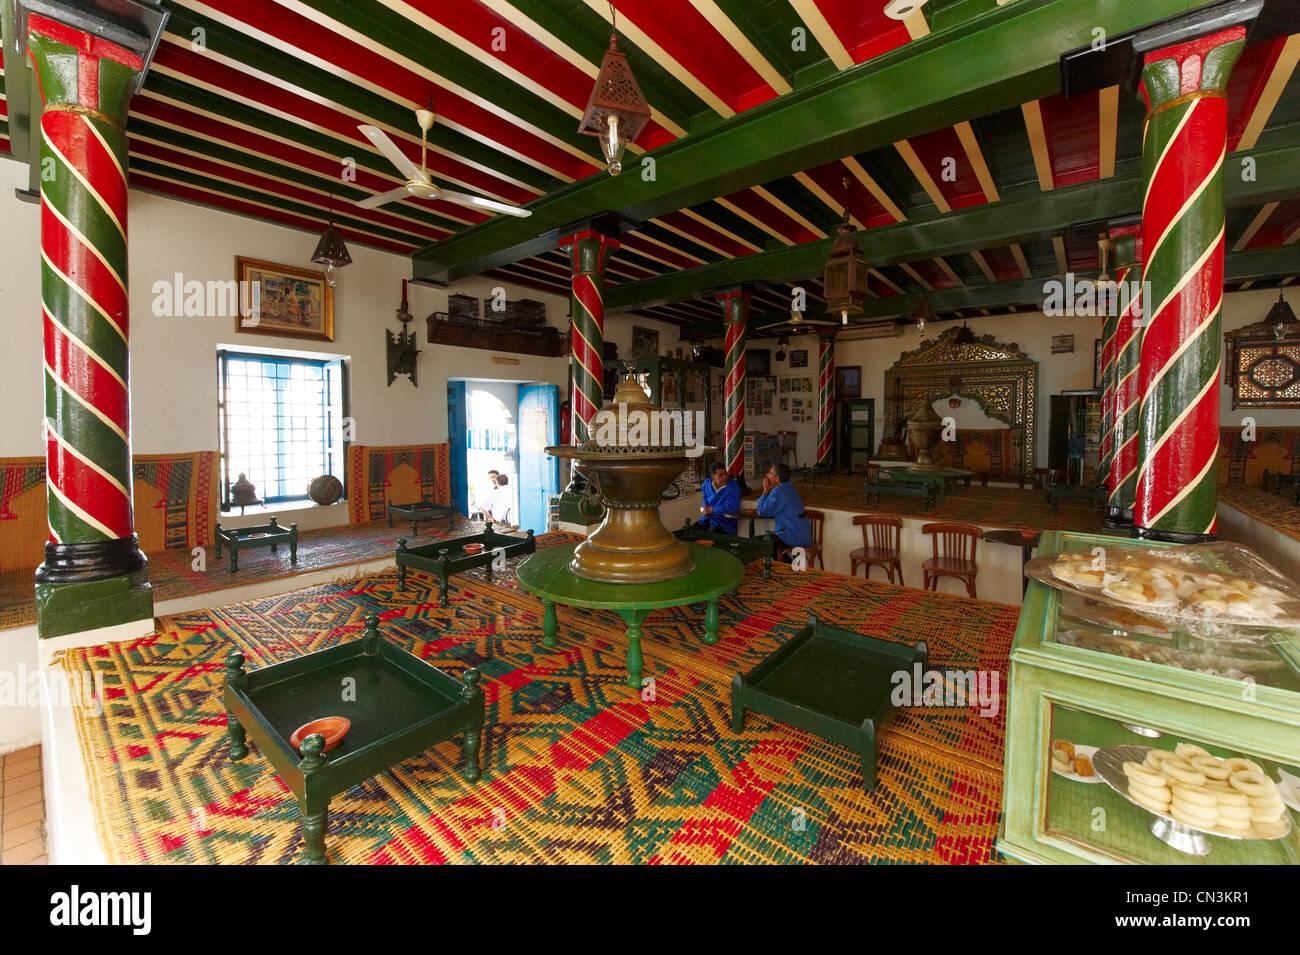 Africa Tunisia Sidi Bou Restaurant Stock Photos & Africa Tunisia ...